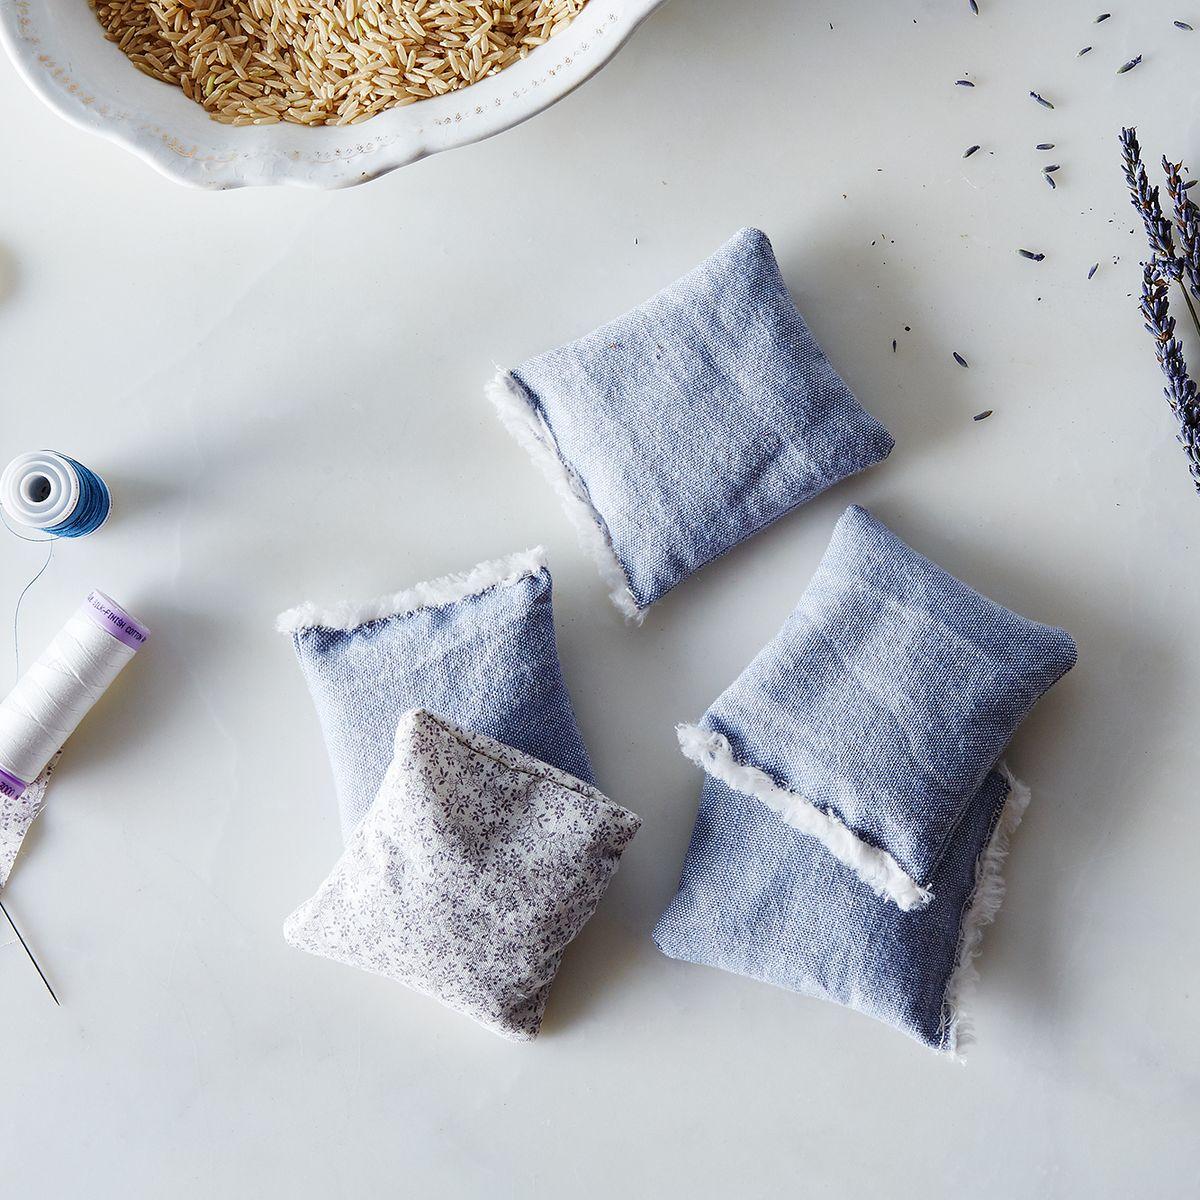 DIY Lavender Sachets for a Sock Drawer